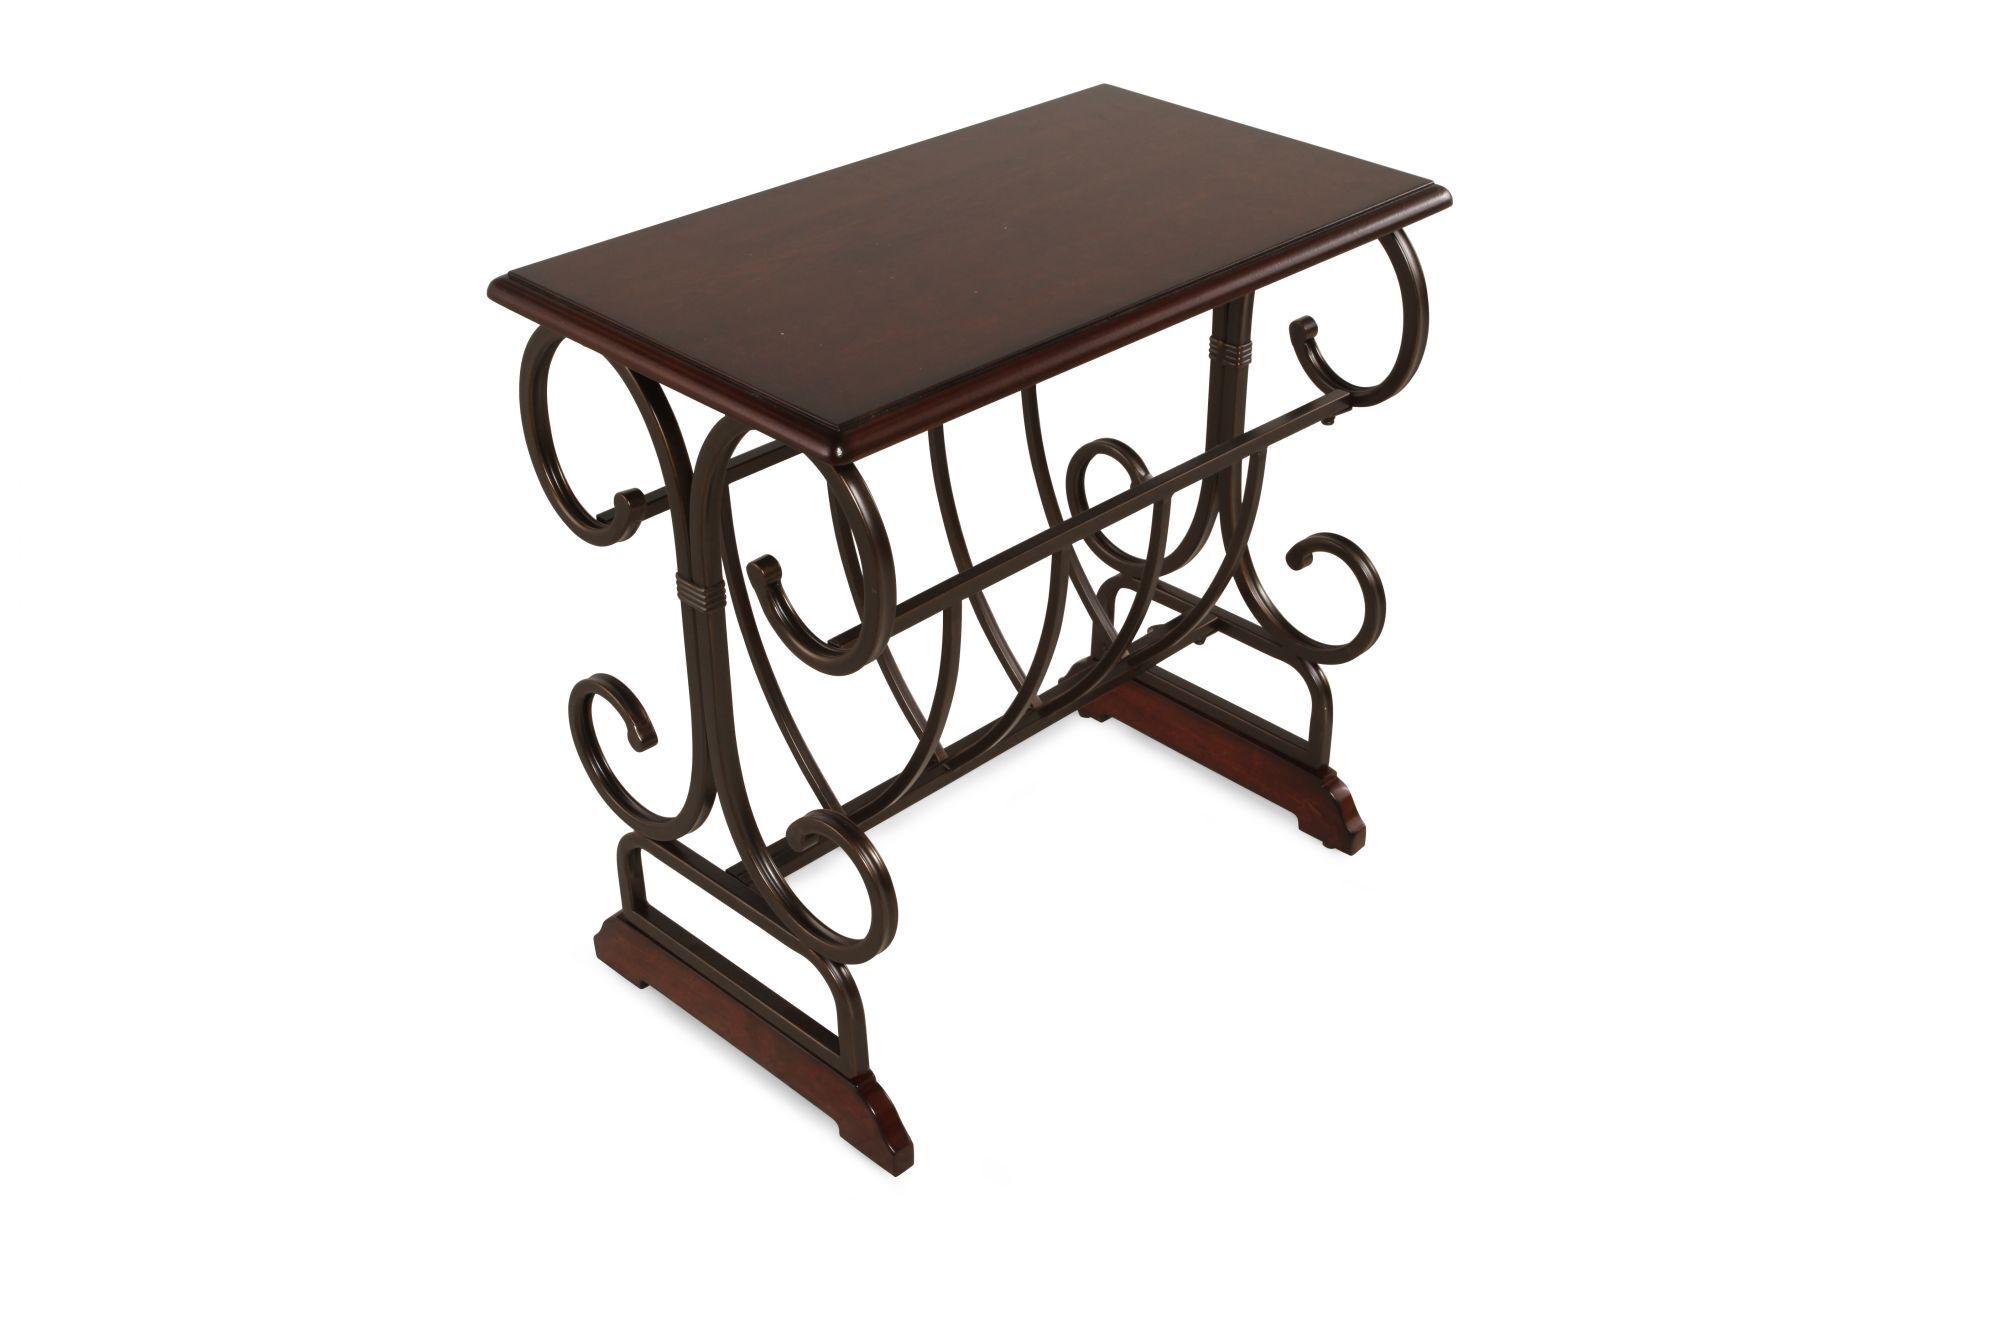 Square Magazine Rack Contemporary Chairside Table In Dark